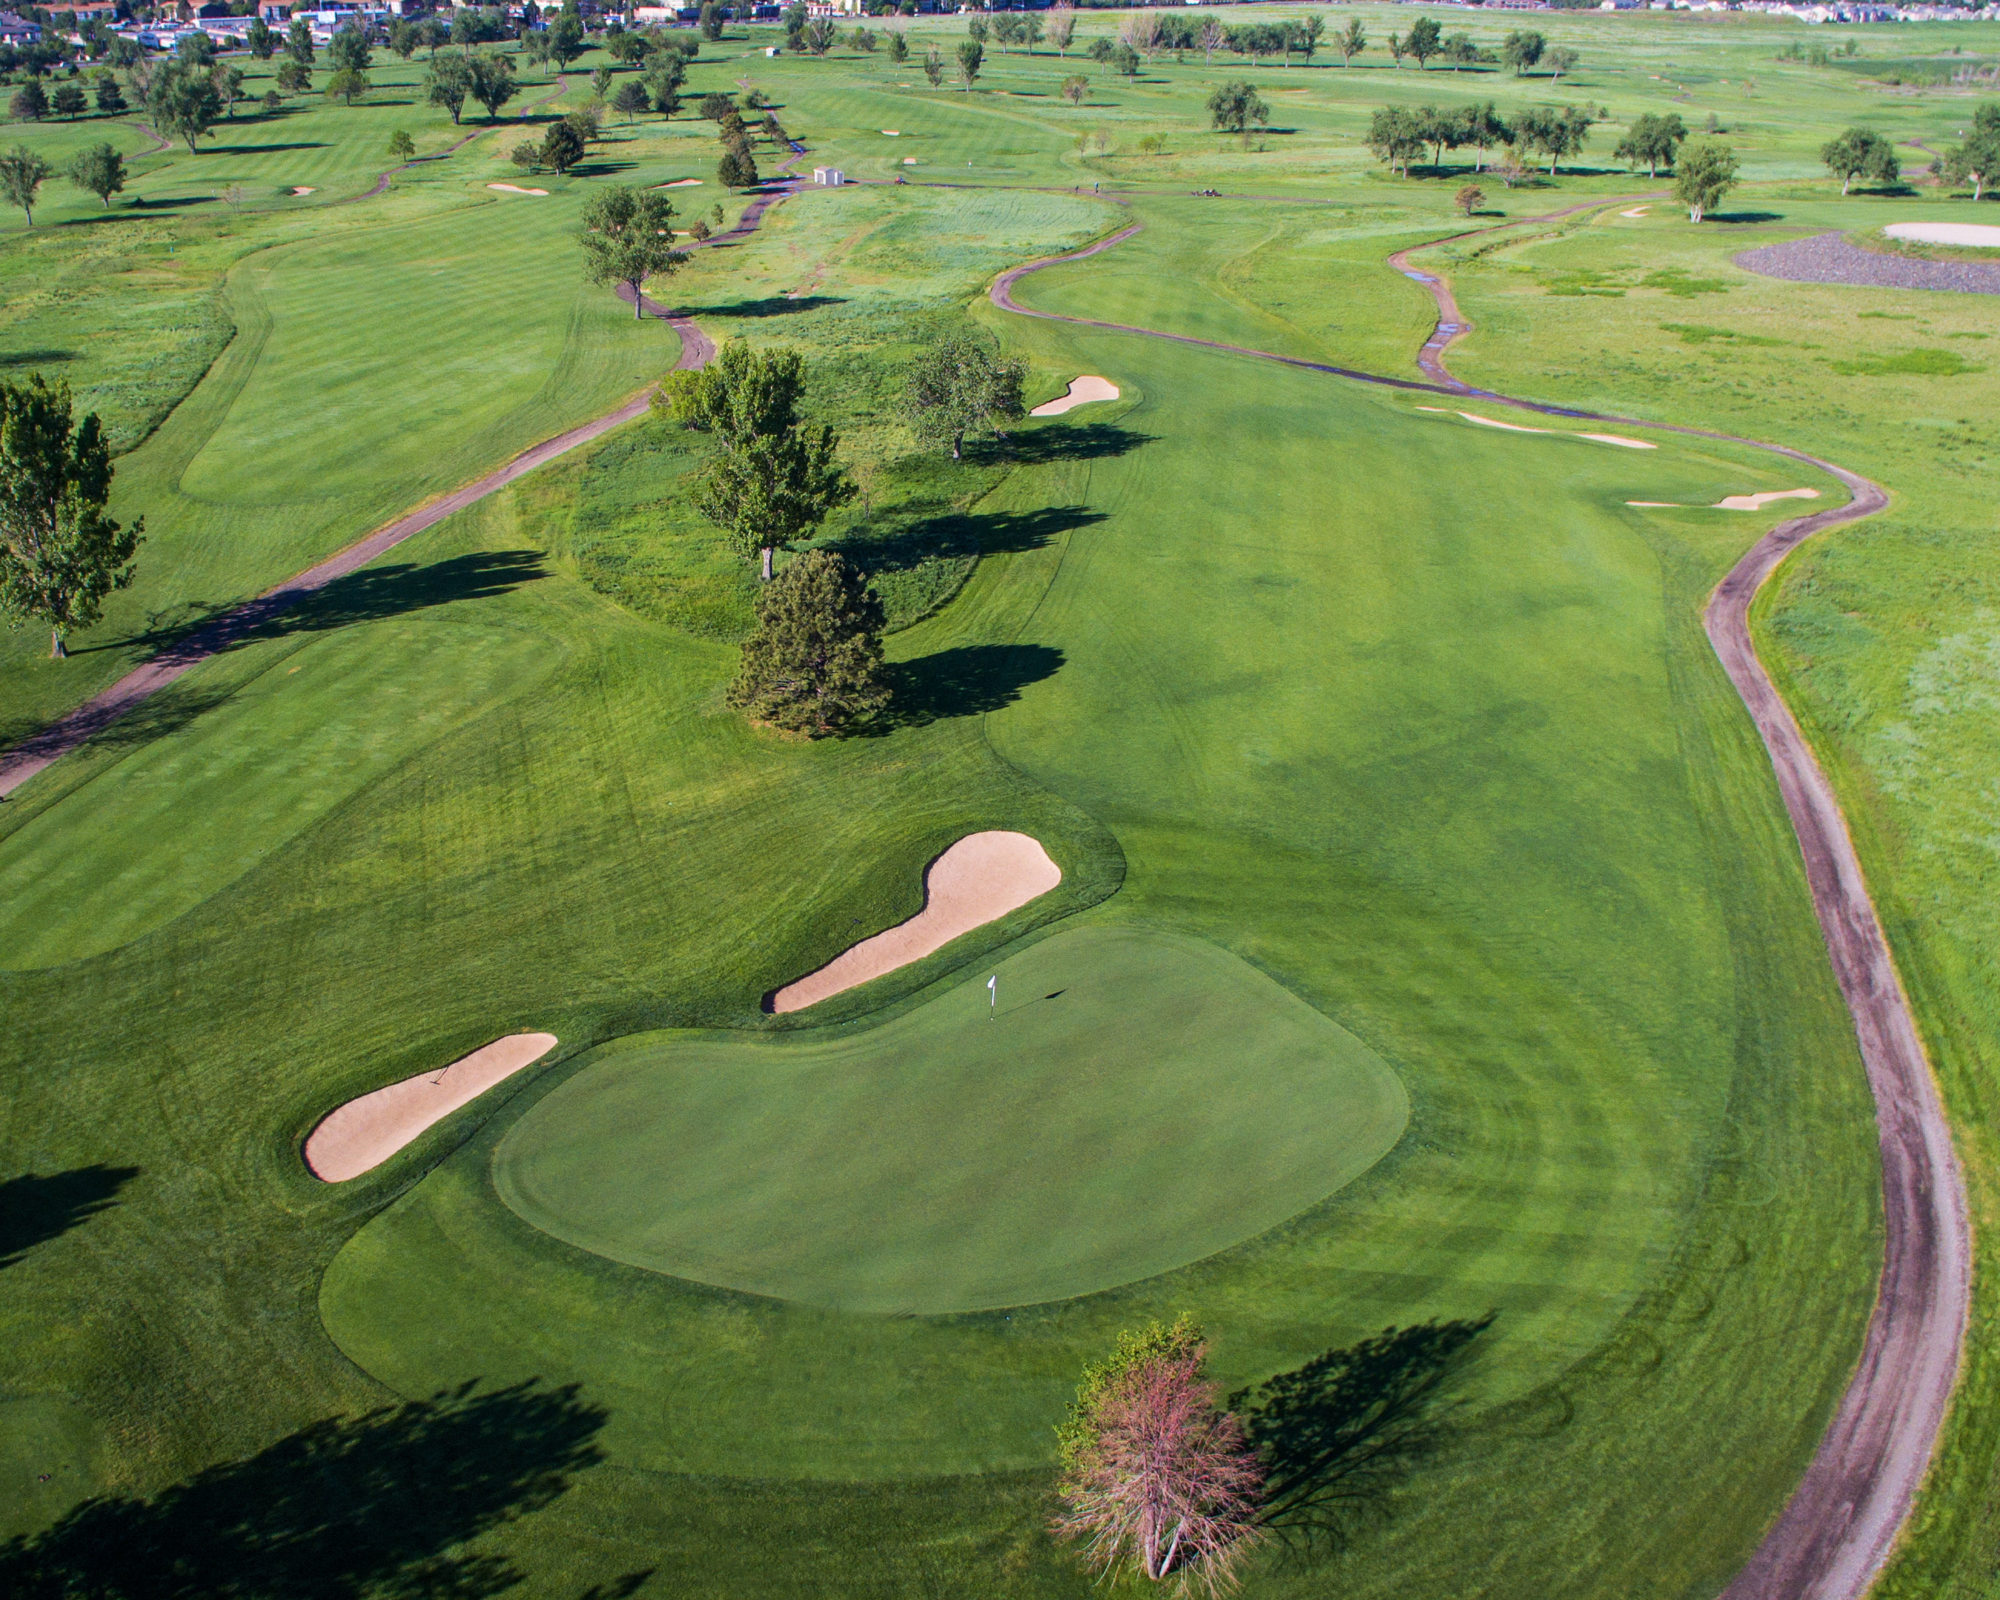 golf course designers